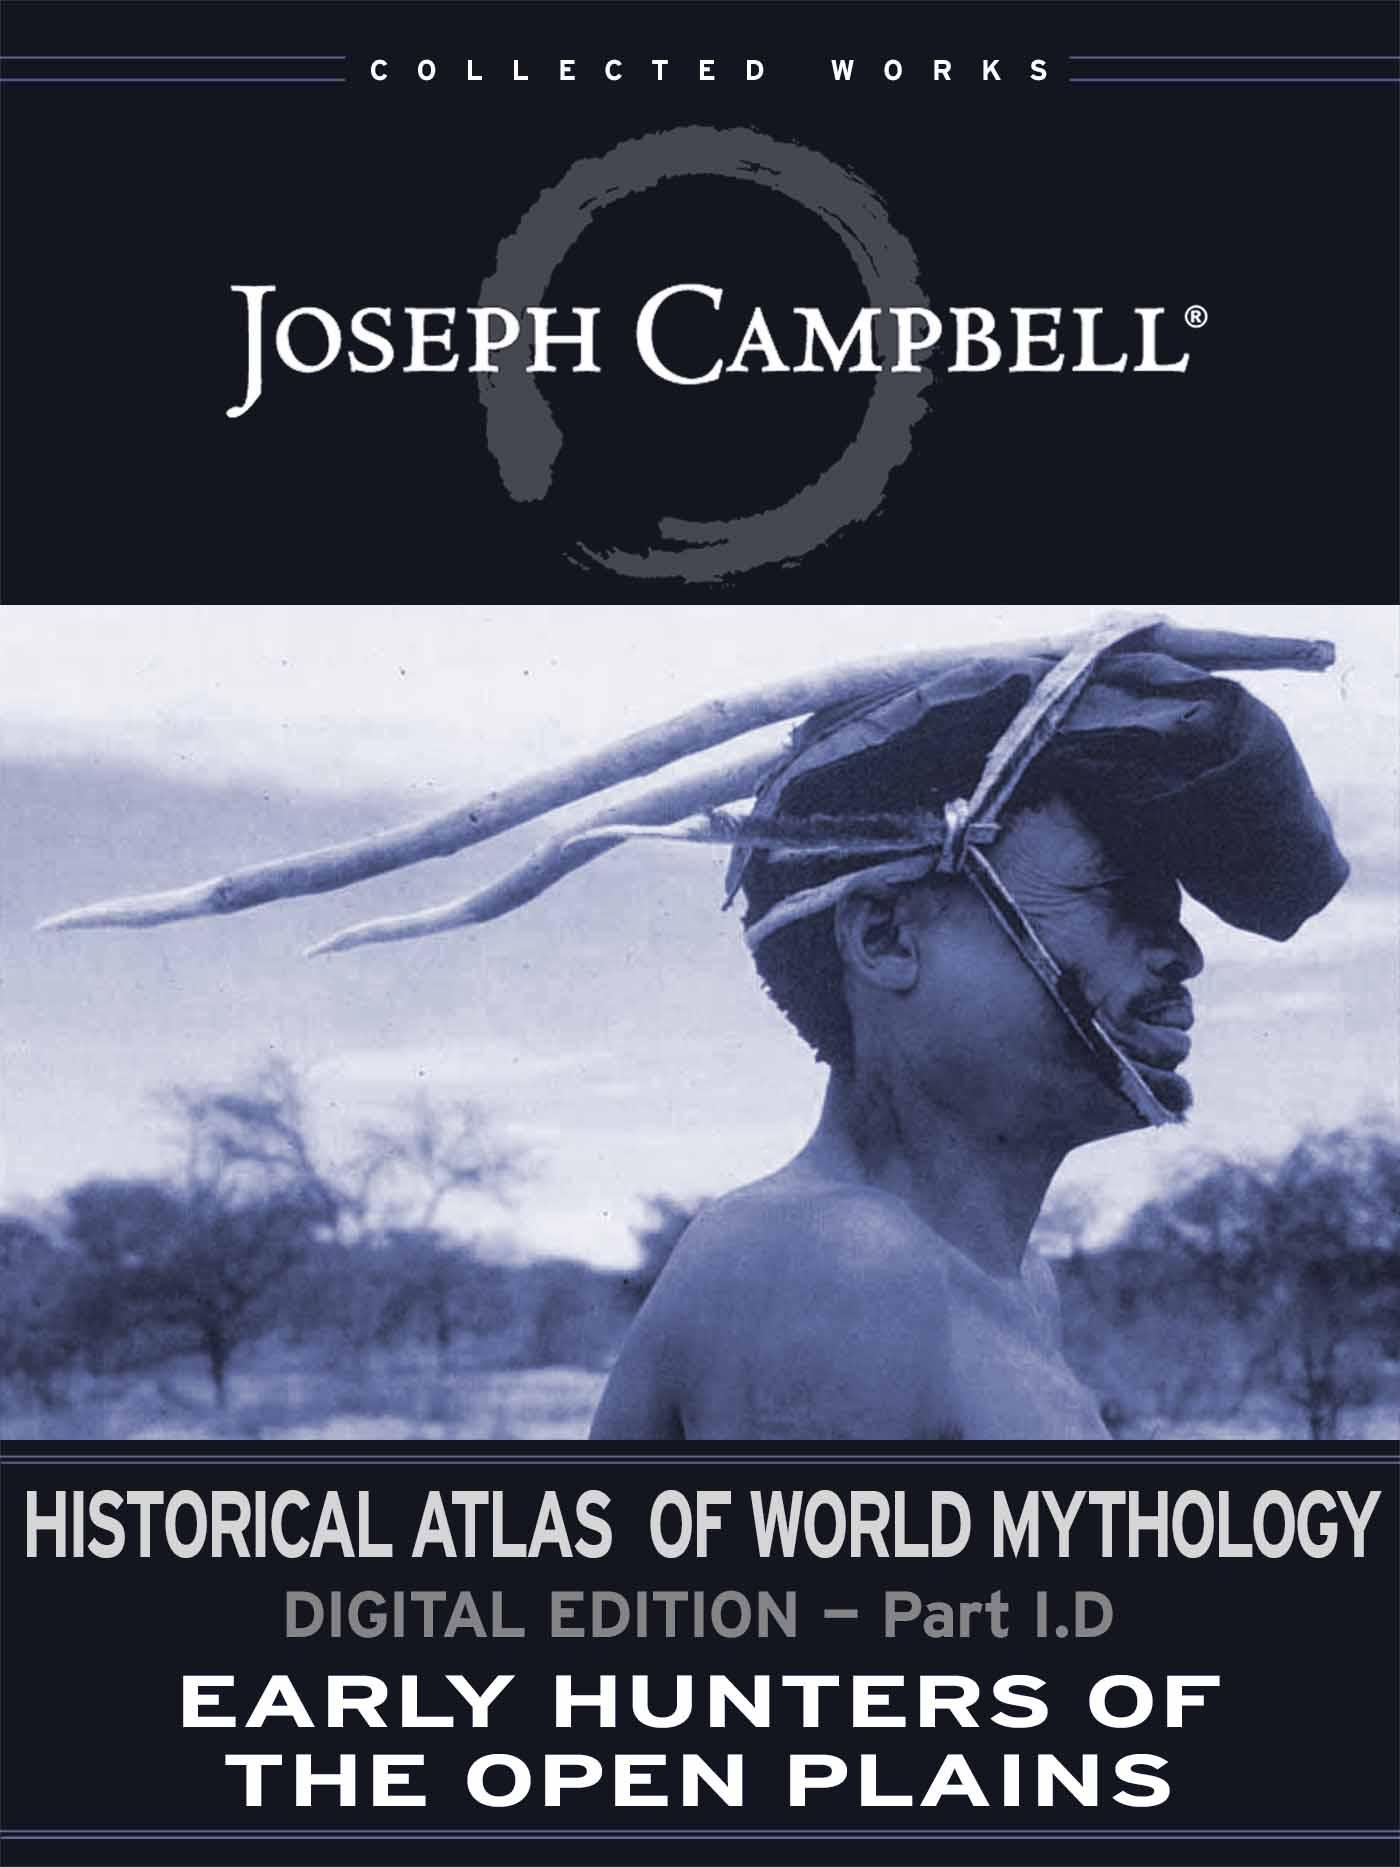 Historical Atlas of World Mythology: (I.D.) Early Hunters of the Open Plains (Esingle)